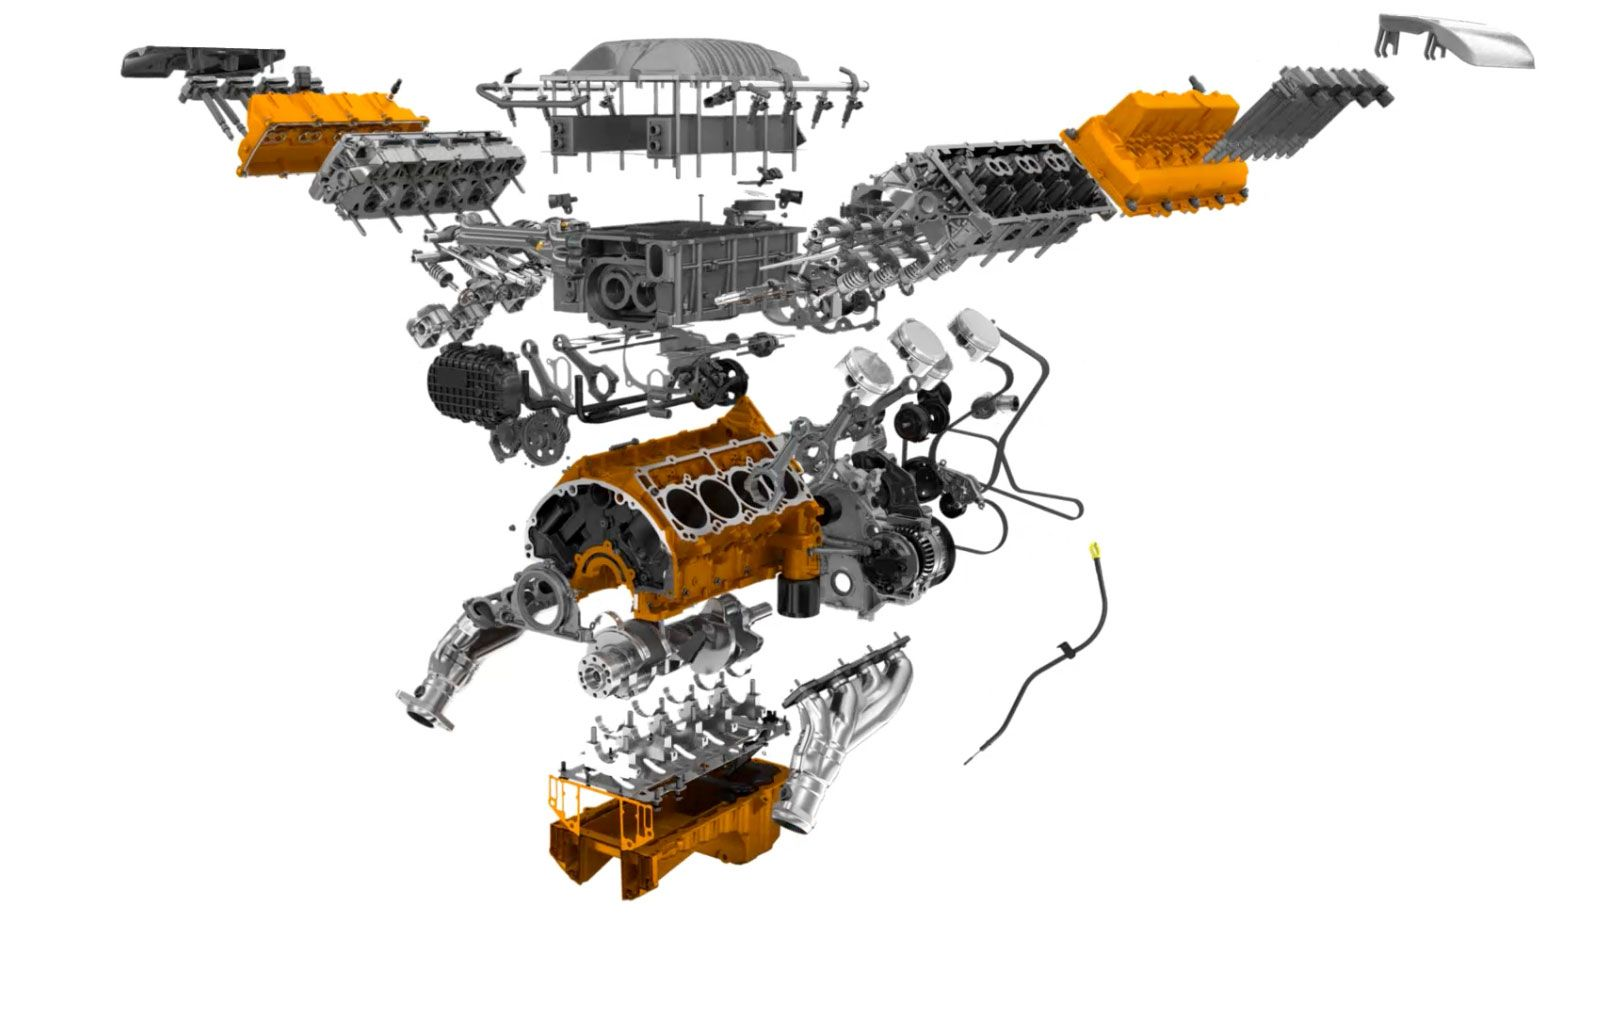 medium resolution of 2015 challenger hemi engine diagram wiring diagram mega 2015 dodge challenger engine diagram 707 hp 6